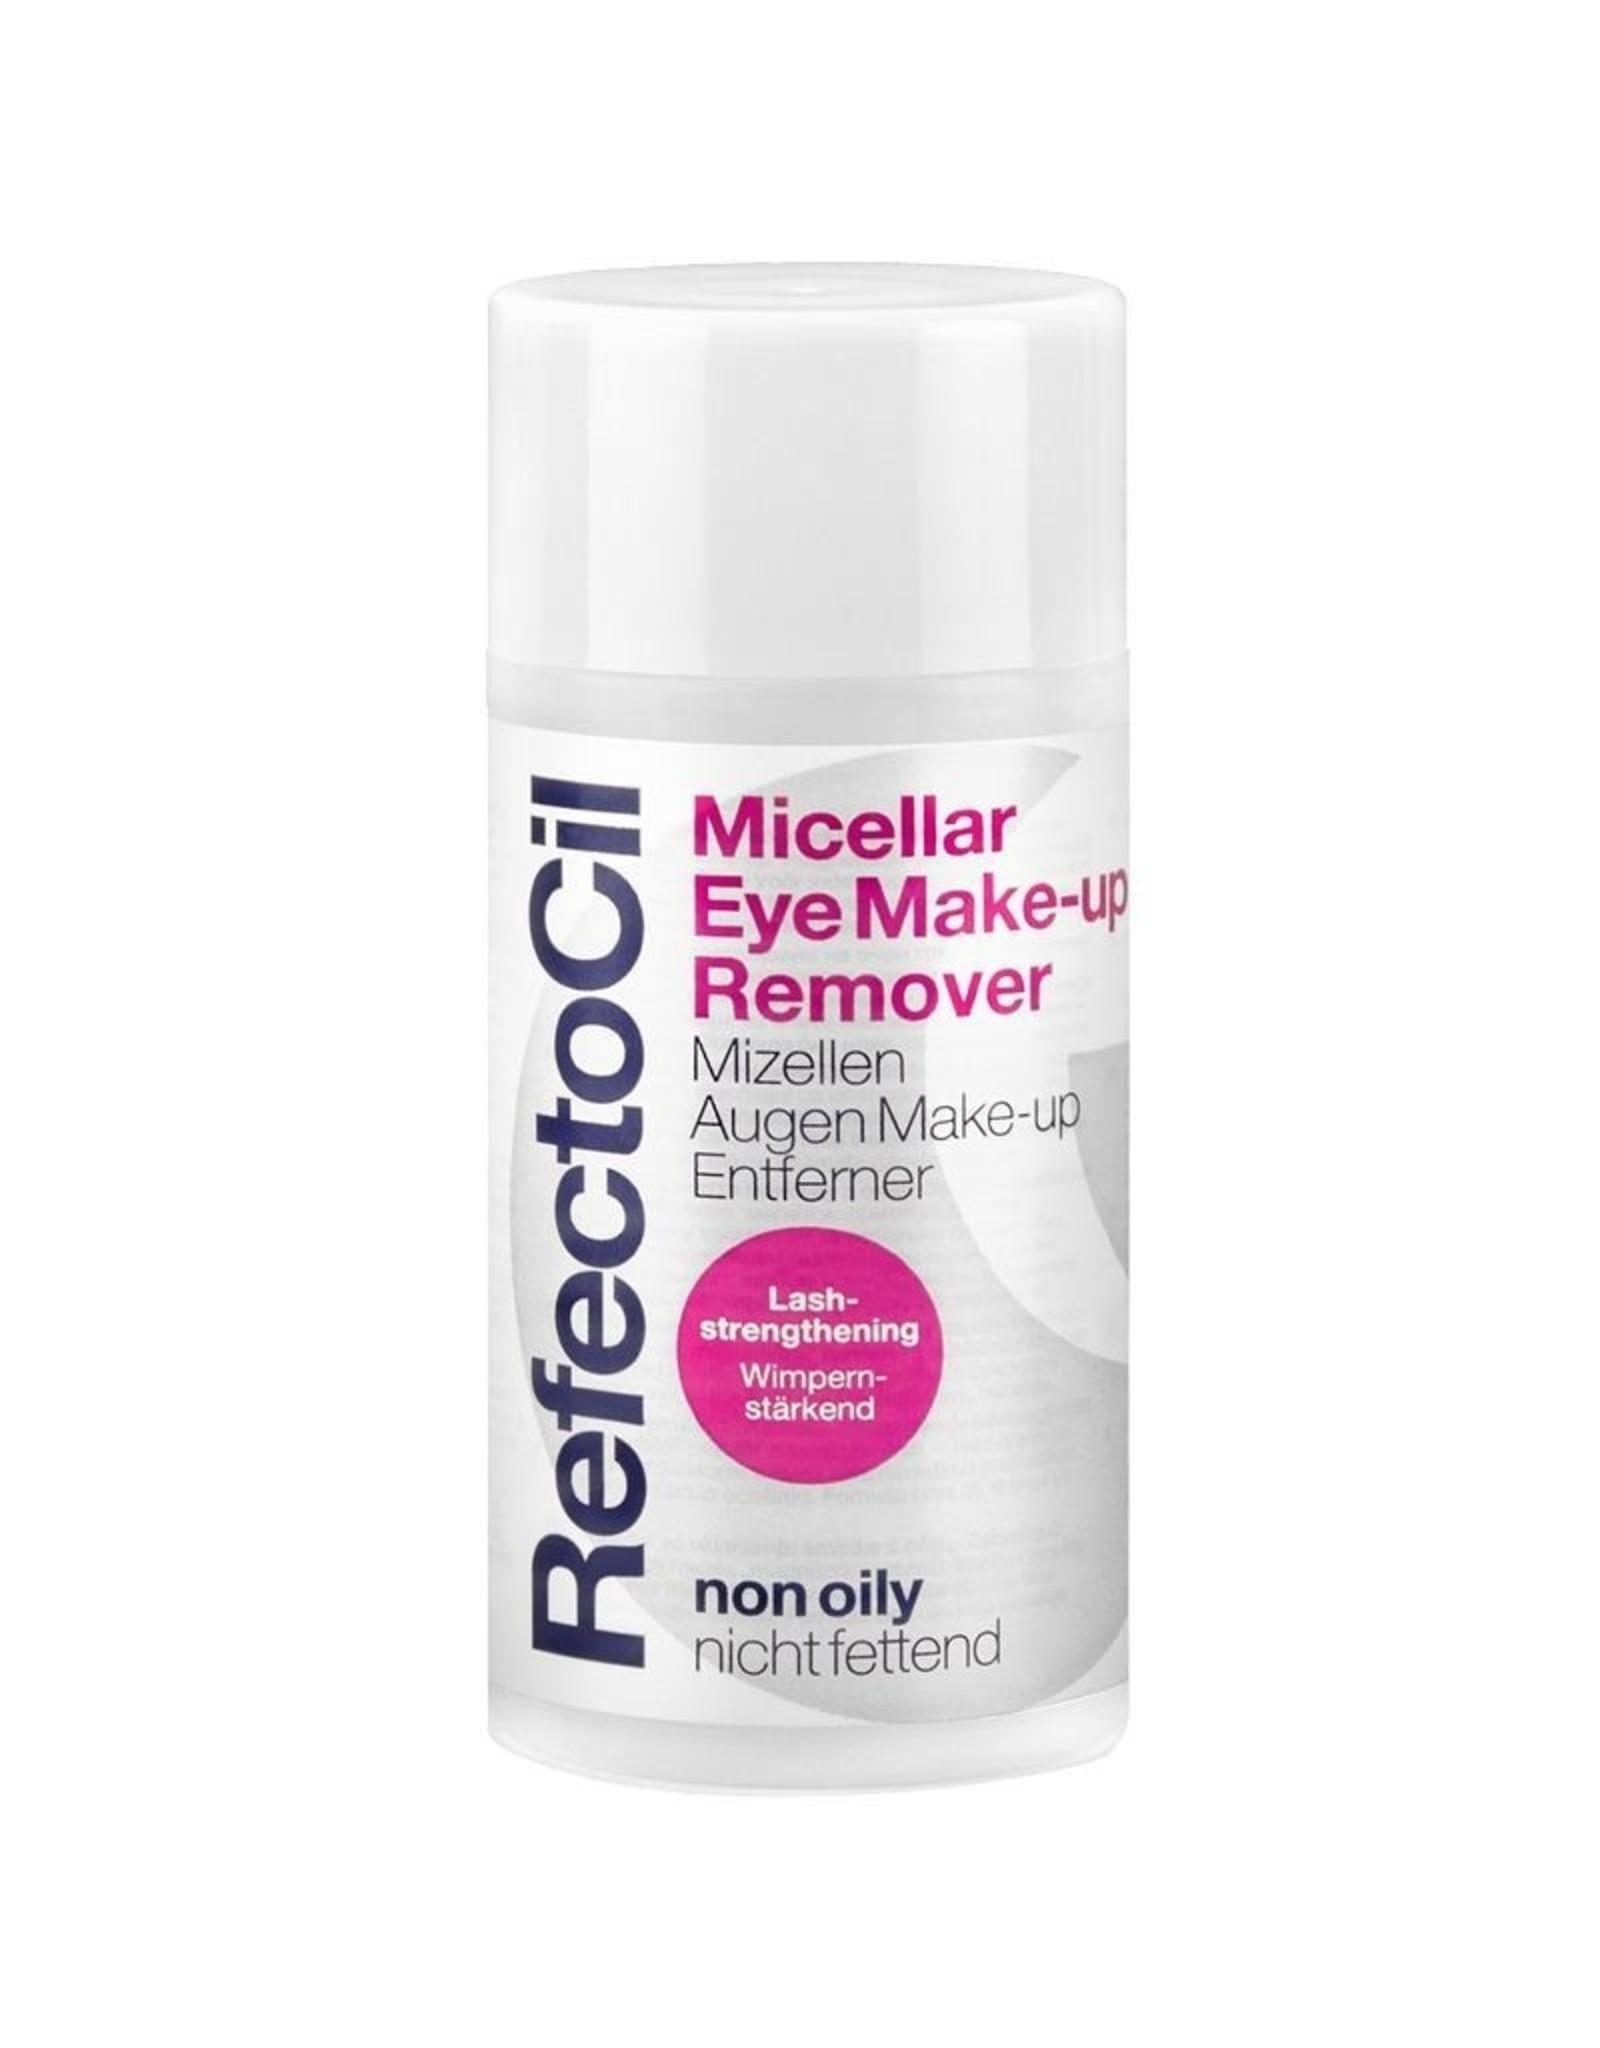 Mega Beauty Shop® RefectoCil micellar oog make-up remover 150ml